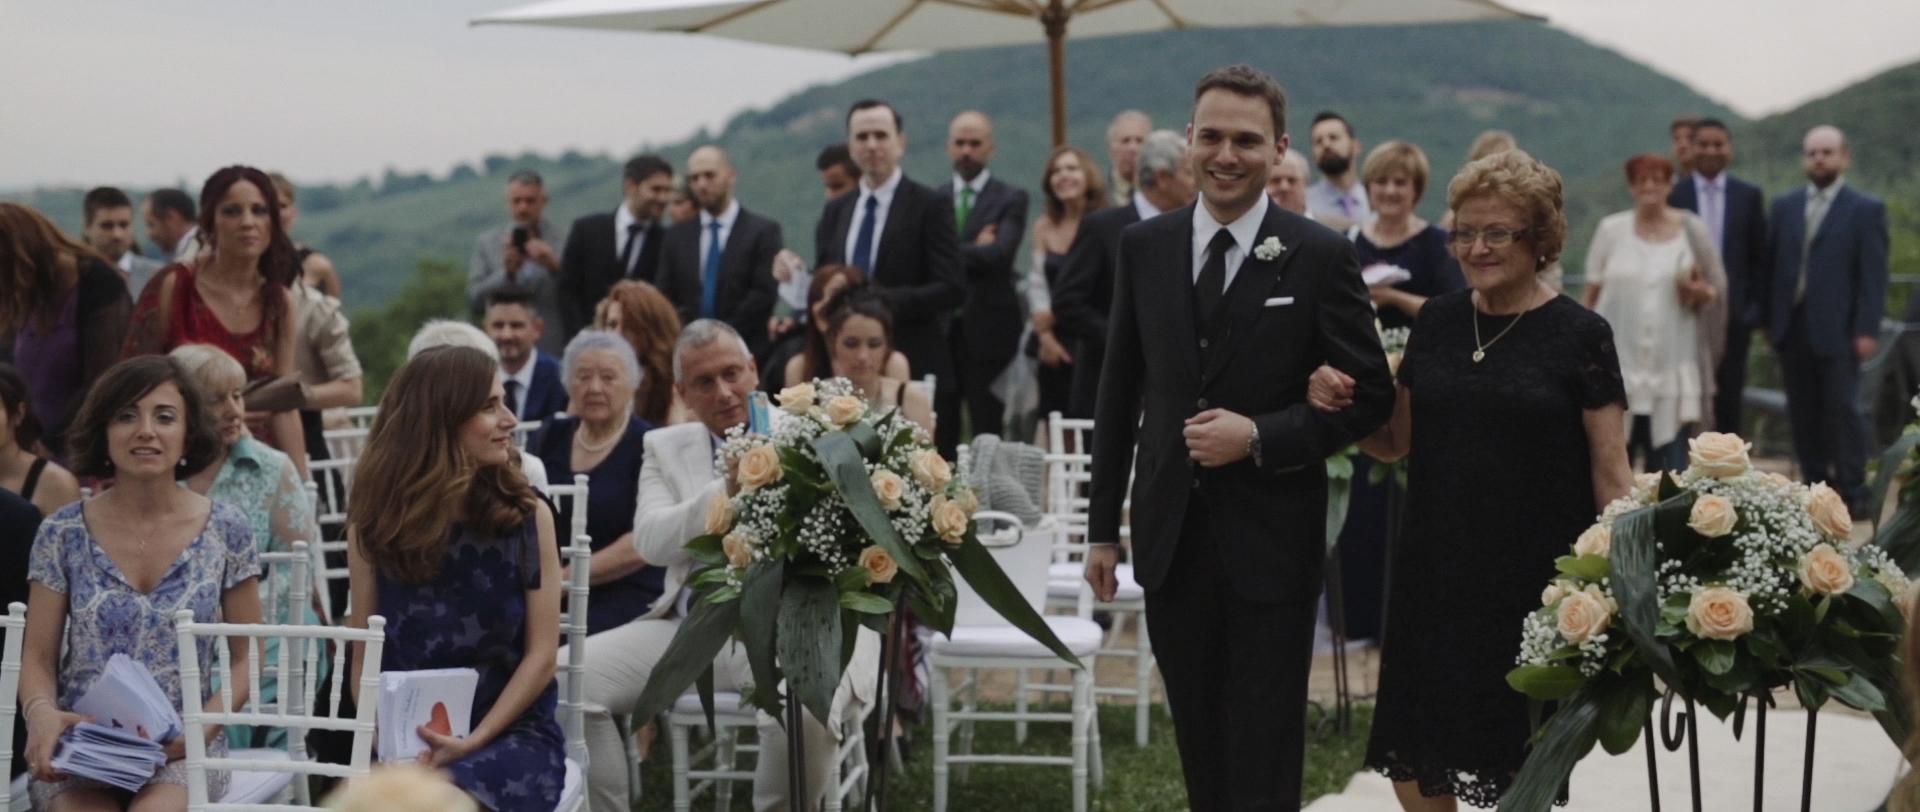 Frederic & Valentina | Trailer (Eng) 15